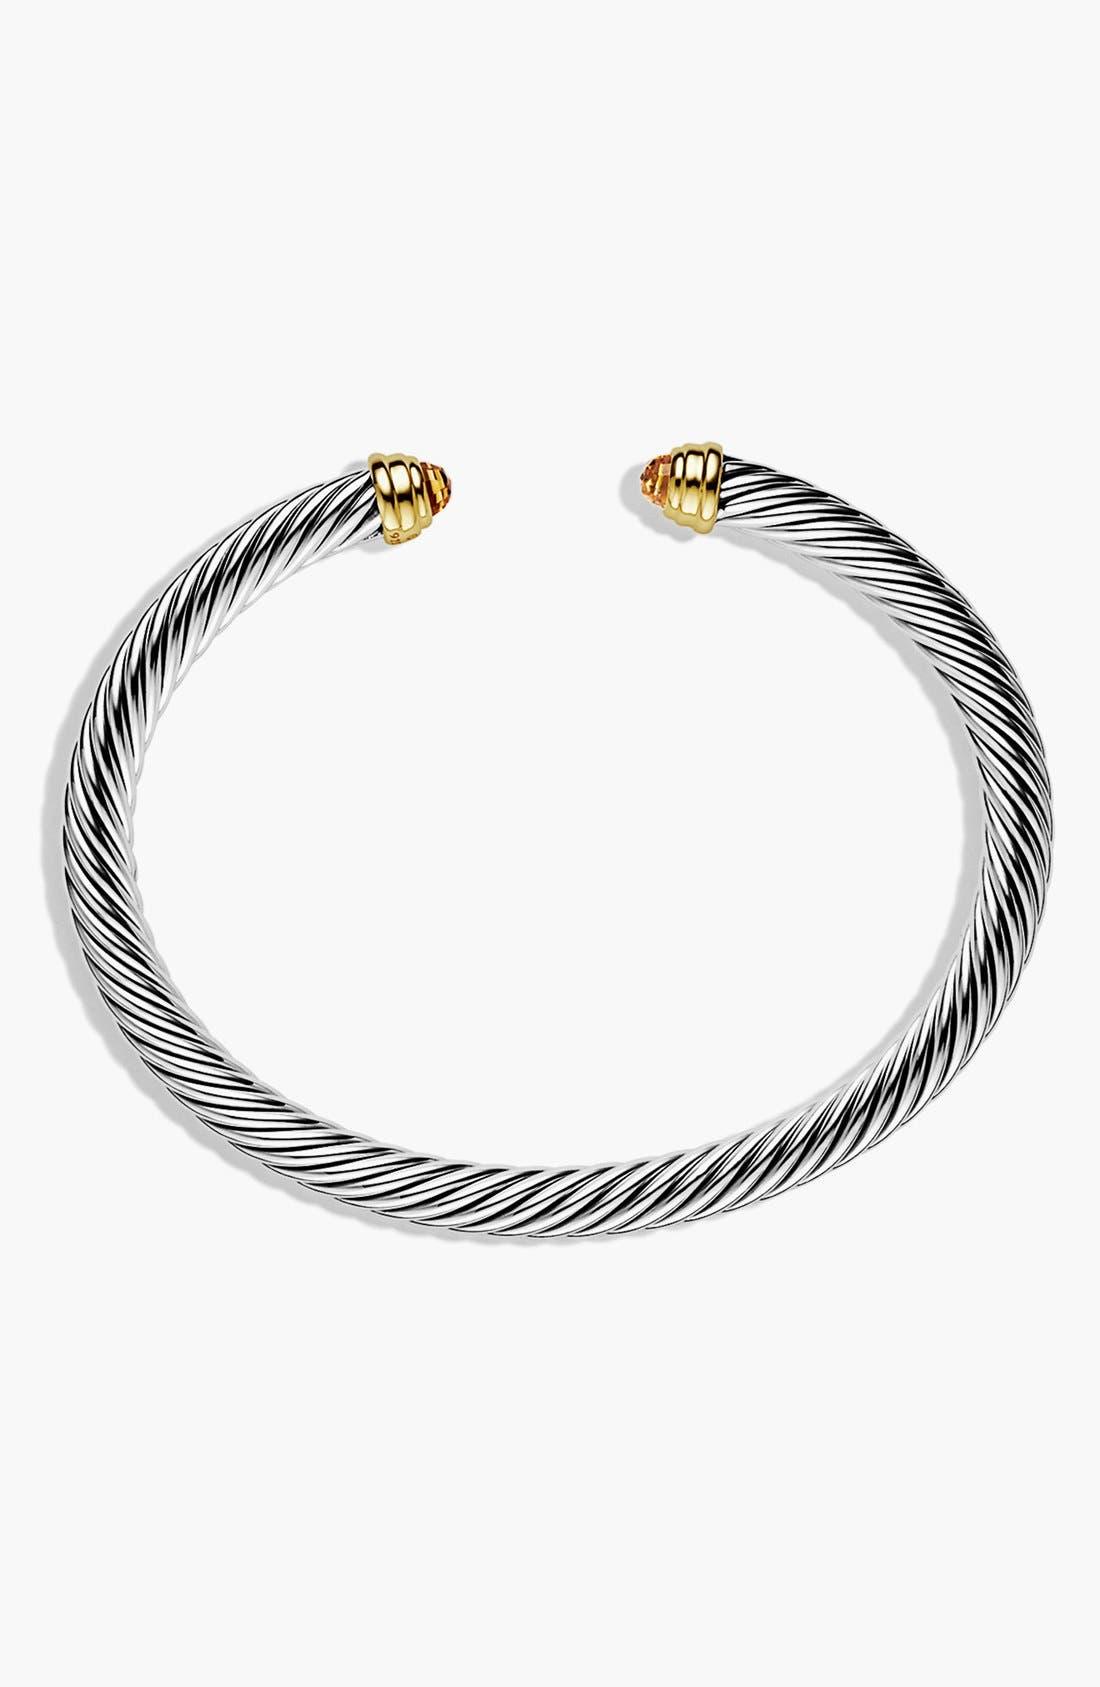 Alternate Image 2  - David Yurman 'Cable Classics' Bracelet with Semiprecious Stones & Gold